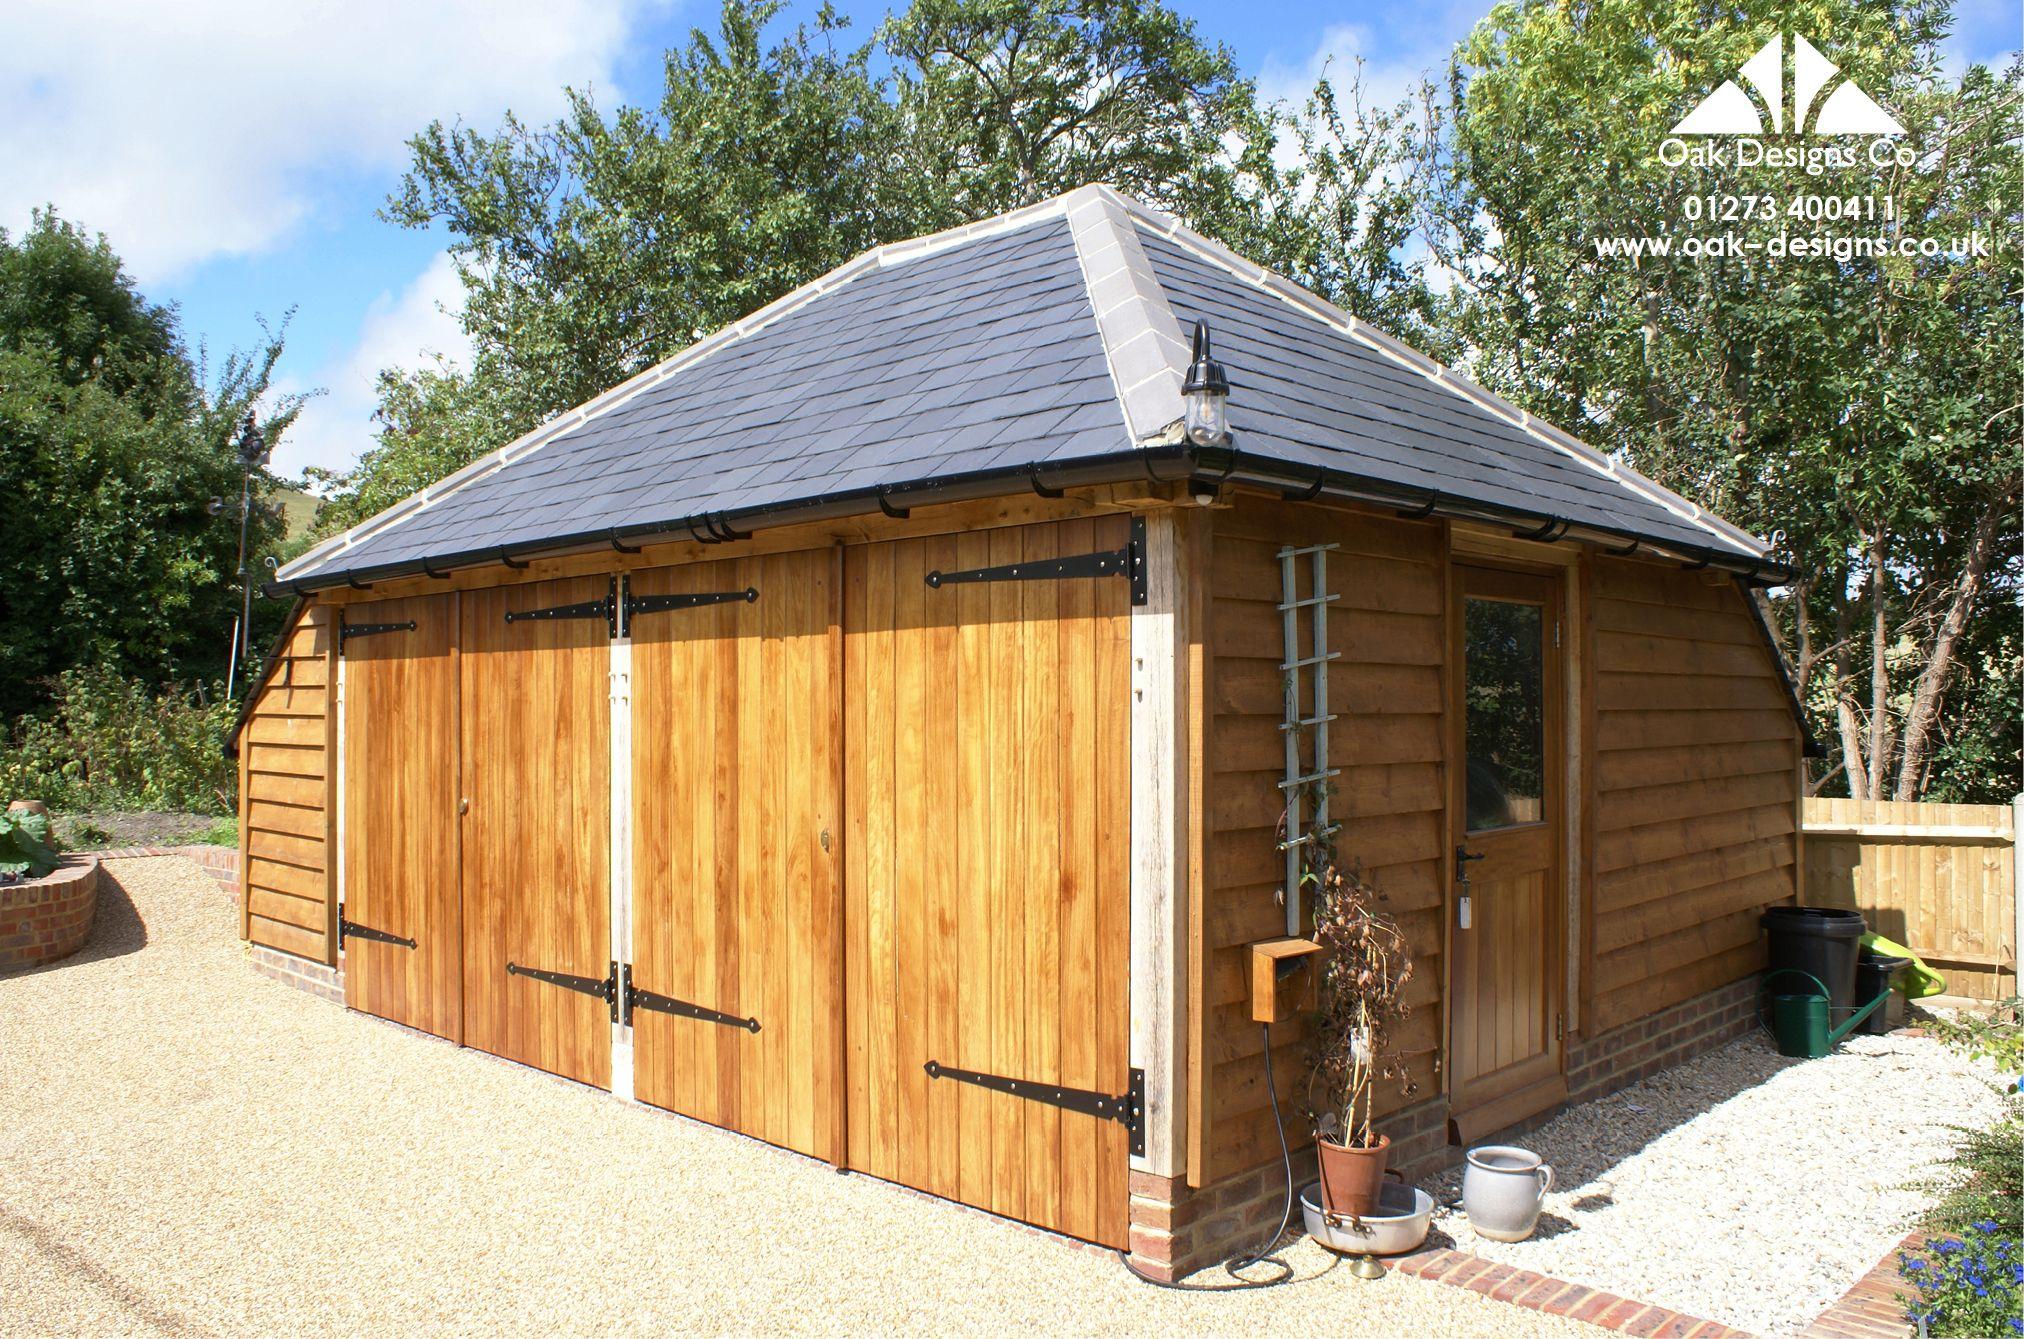 slate roof garage with wine store & aisle Garage design